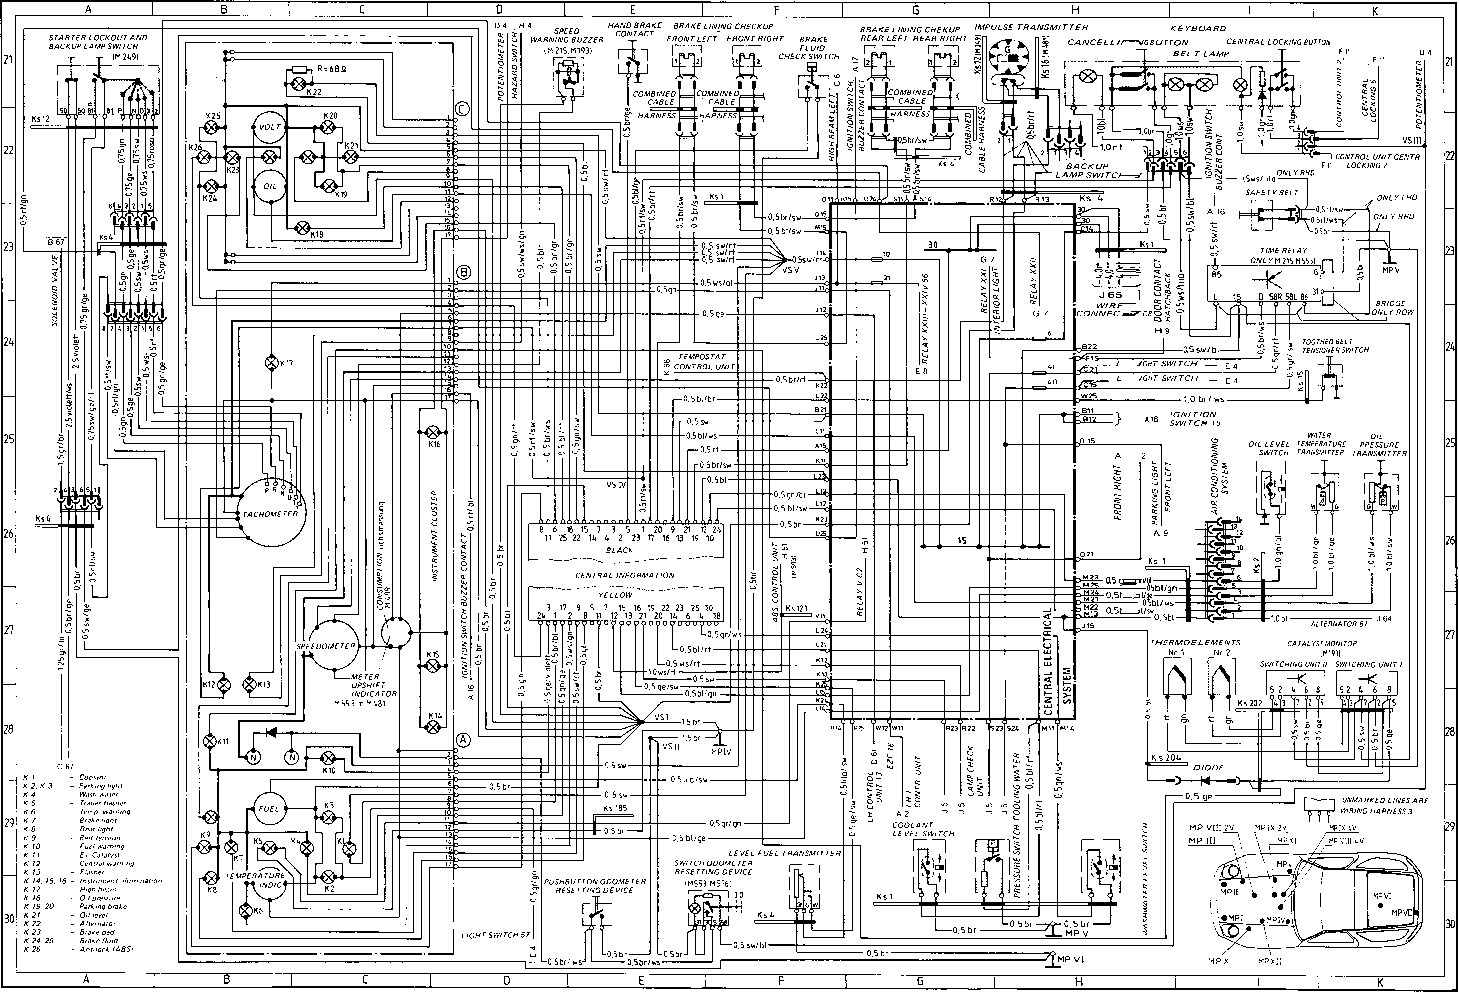 Citroen C2 Central Locking Wiring Diagram Electrical Diagrams Schematics C5 Models List